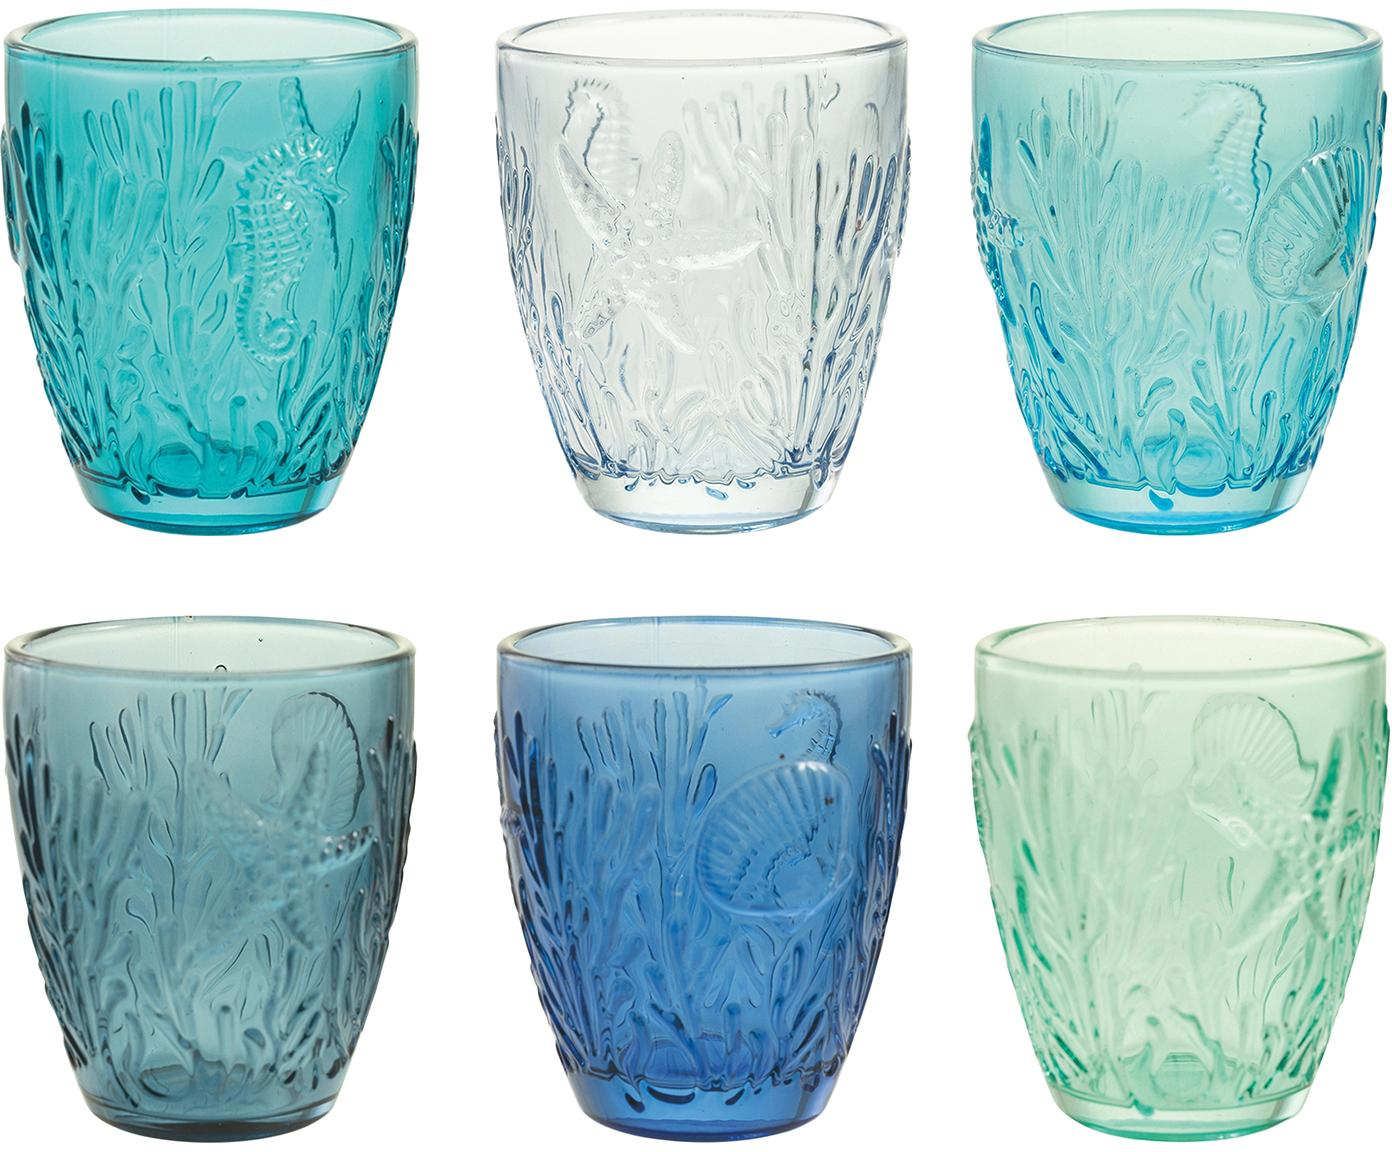 Vasos de colores con relieve Pantelleria, 6uds., Vidrio, Azul, Ø 8 x 10 cm